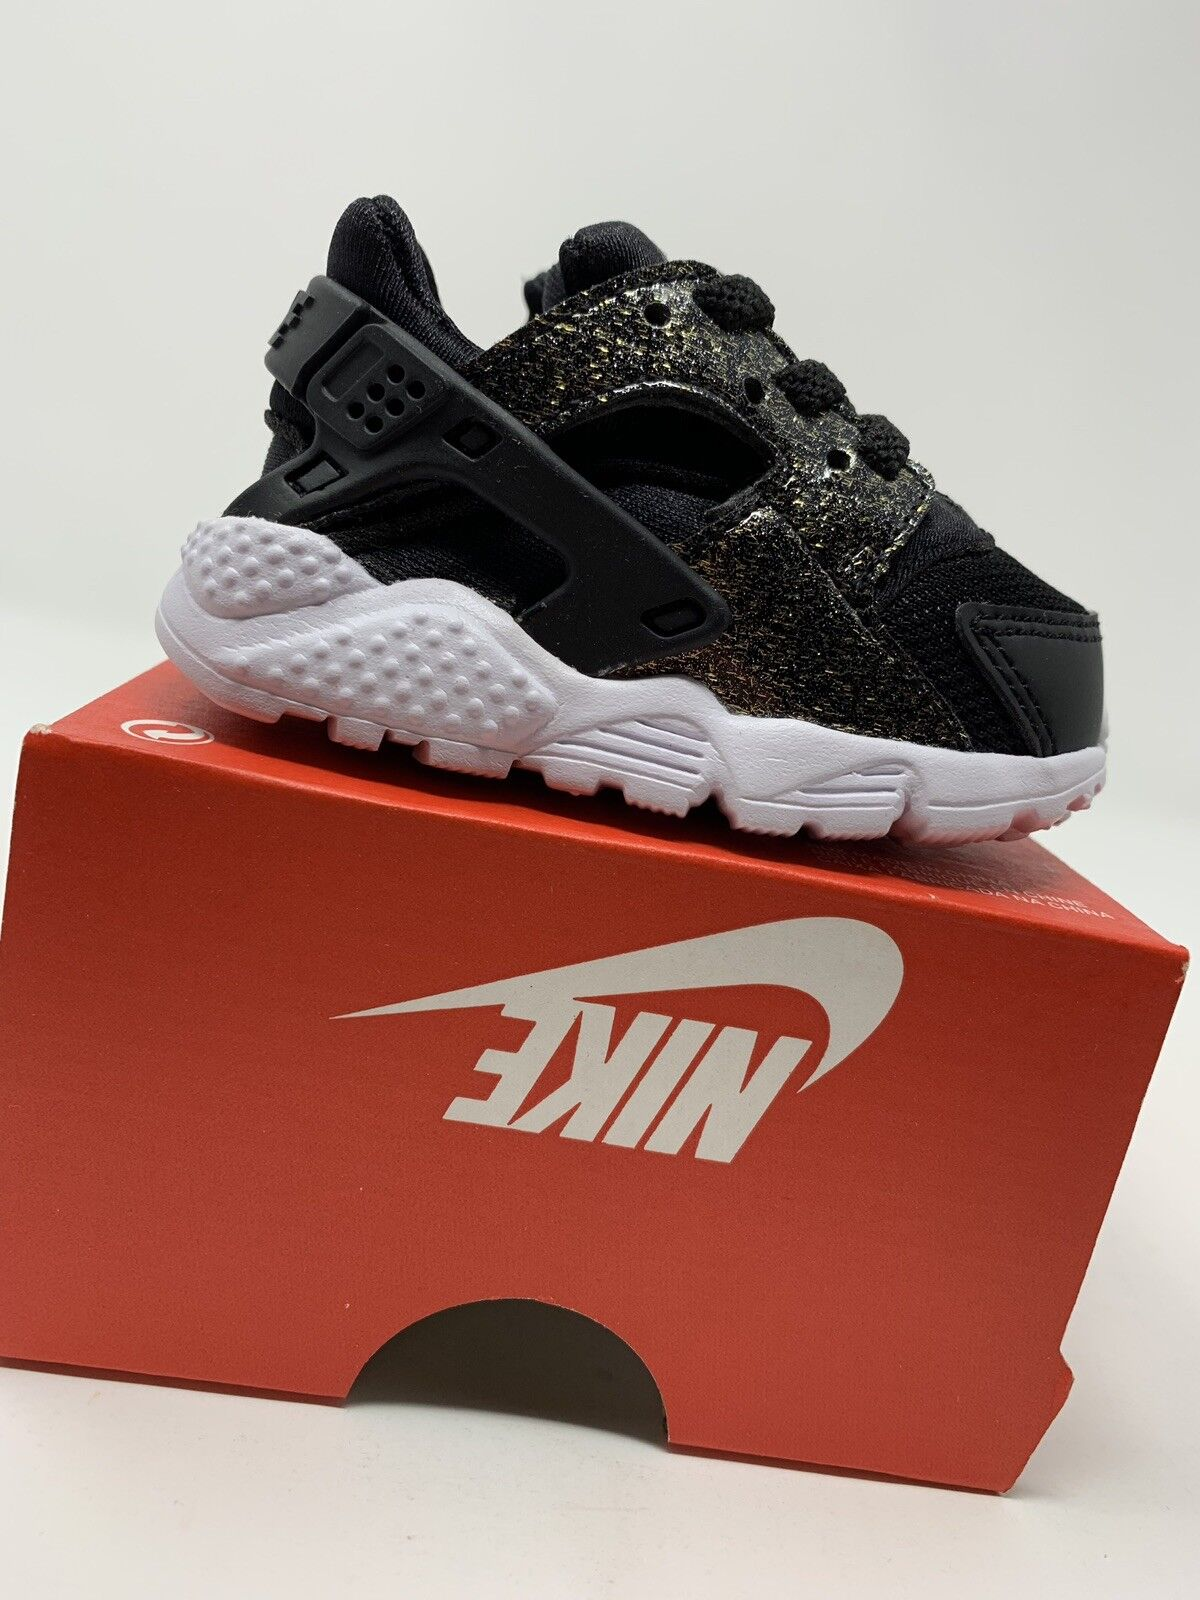 BABY GIRL: Nike Huarache Run SE Shoes, Black & Gold Sparkle - Size 3C 859592-005